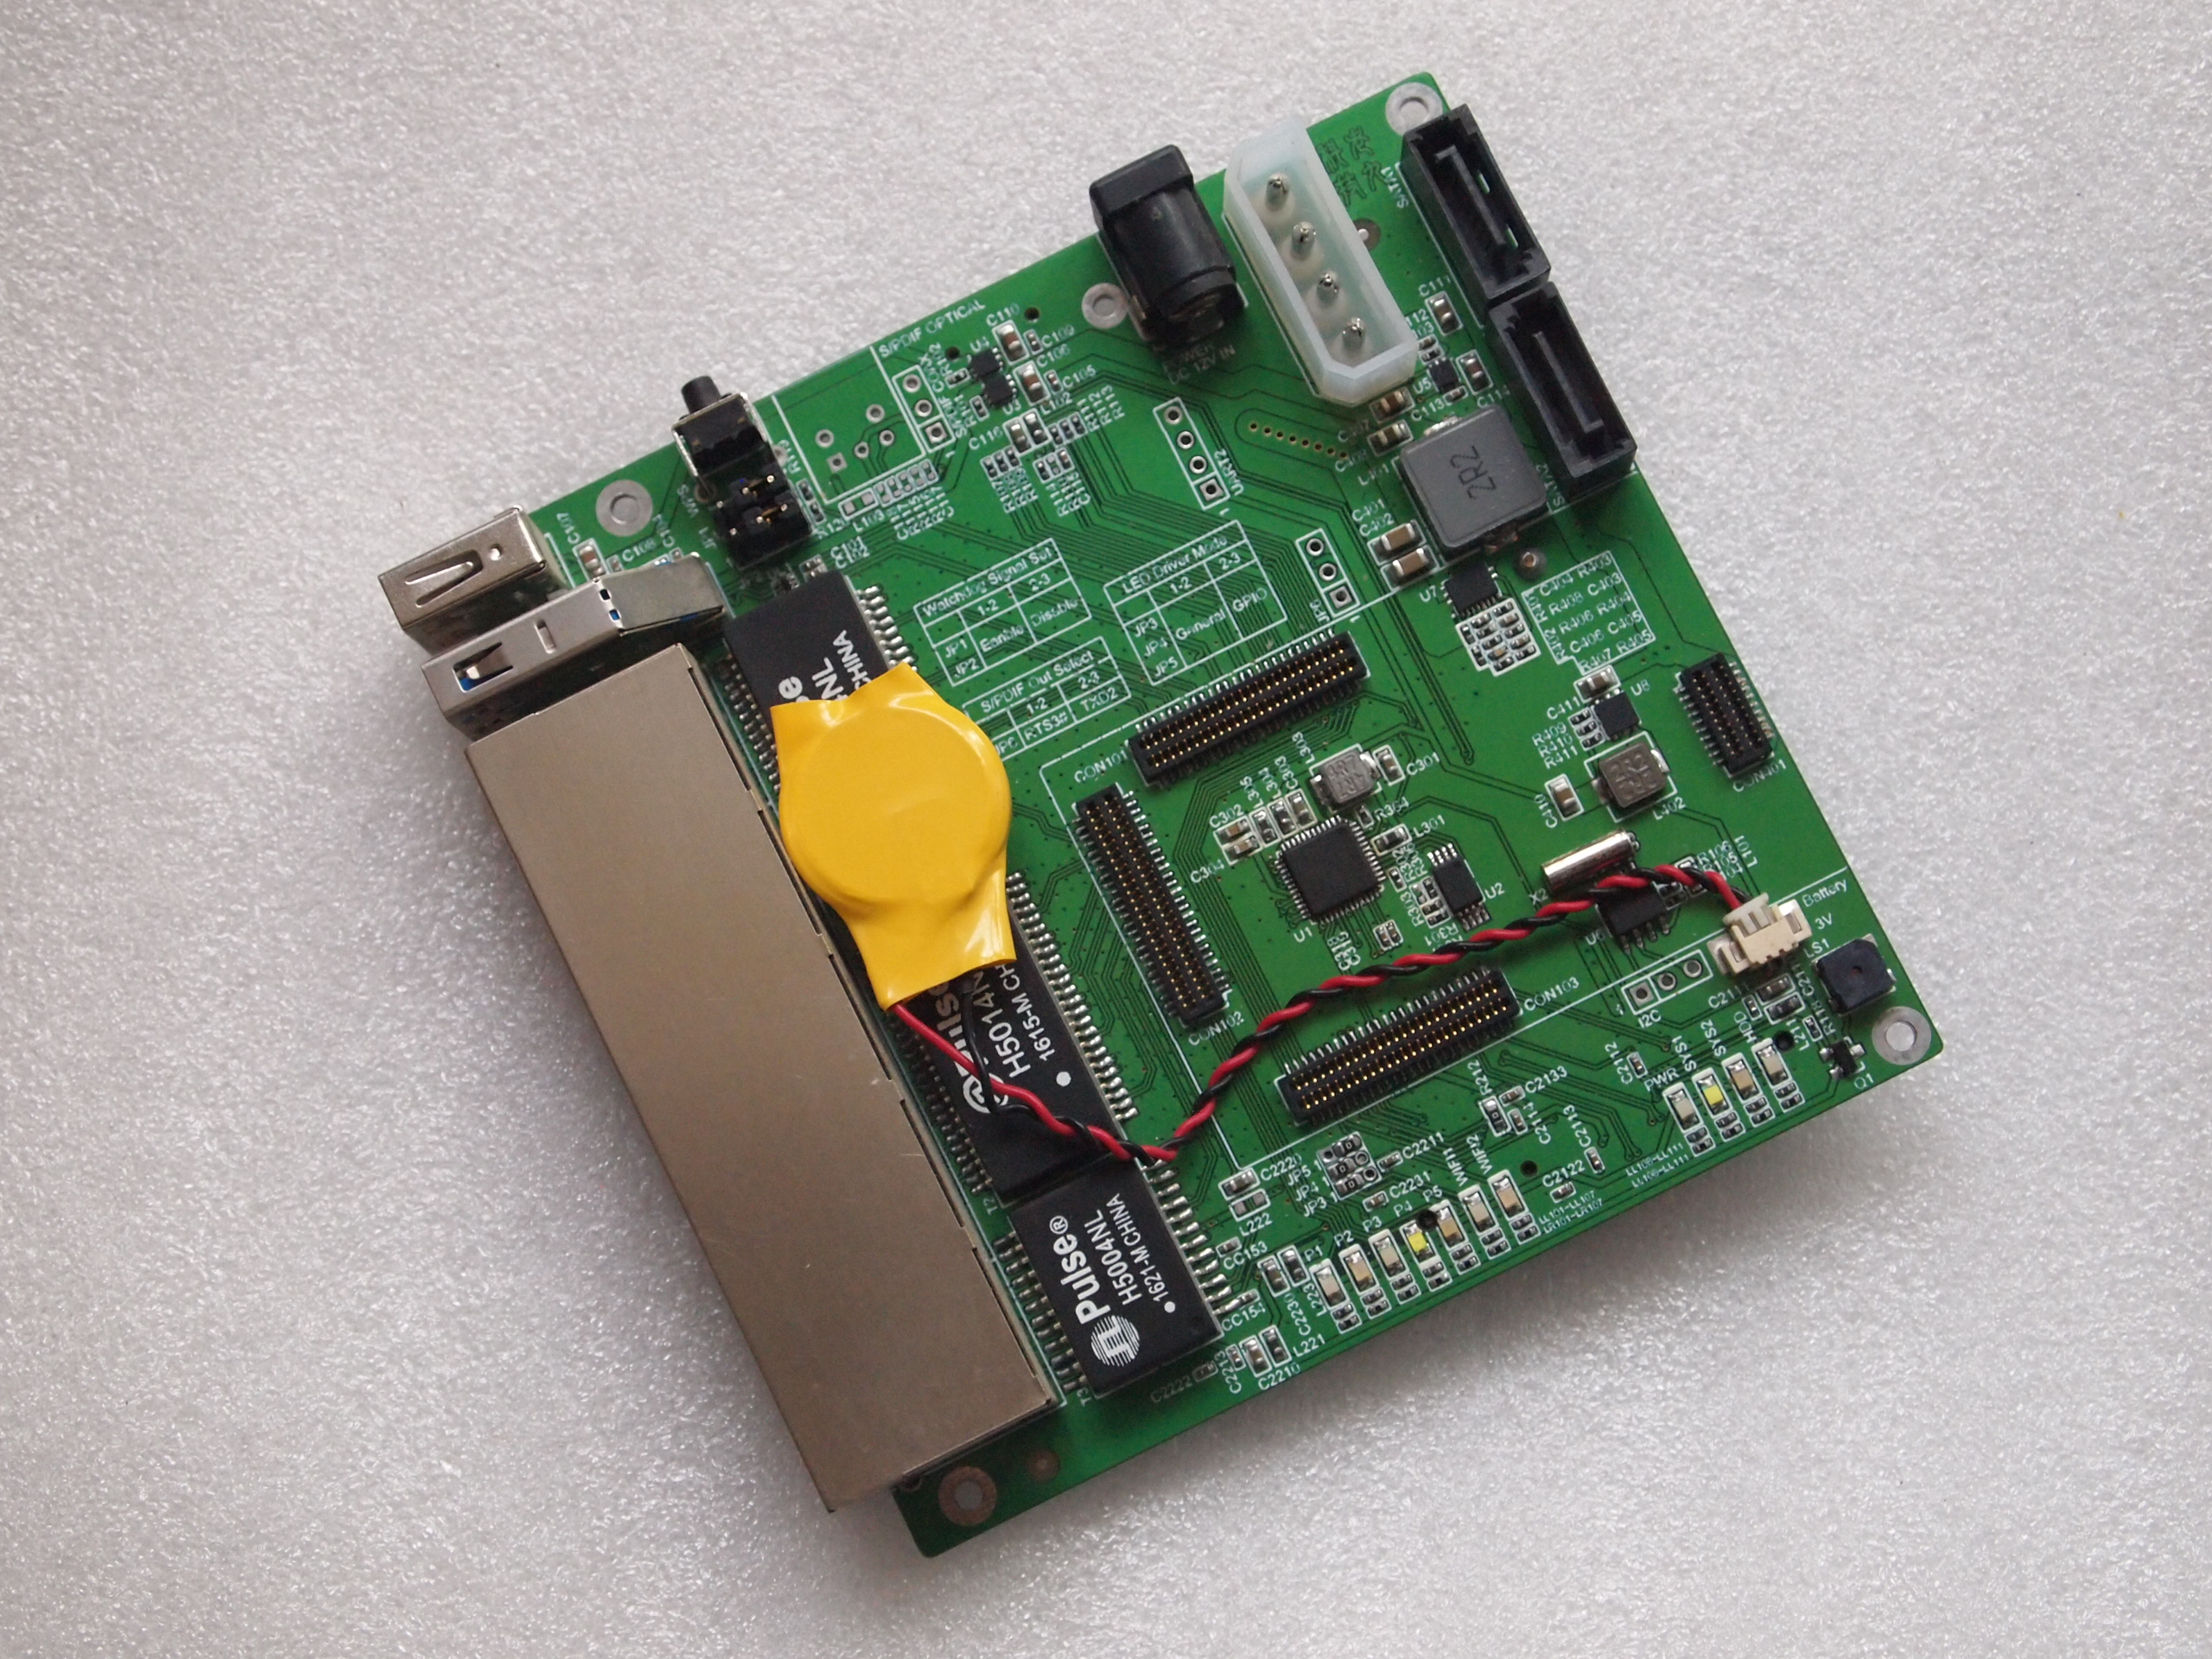 MT7621A Development Board, Interface Board, Full Interface, Small Size, With SATA Interface.